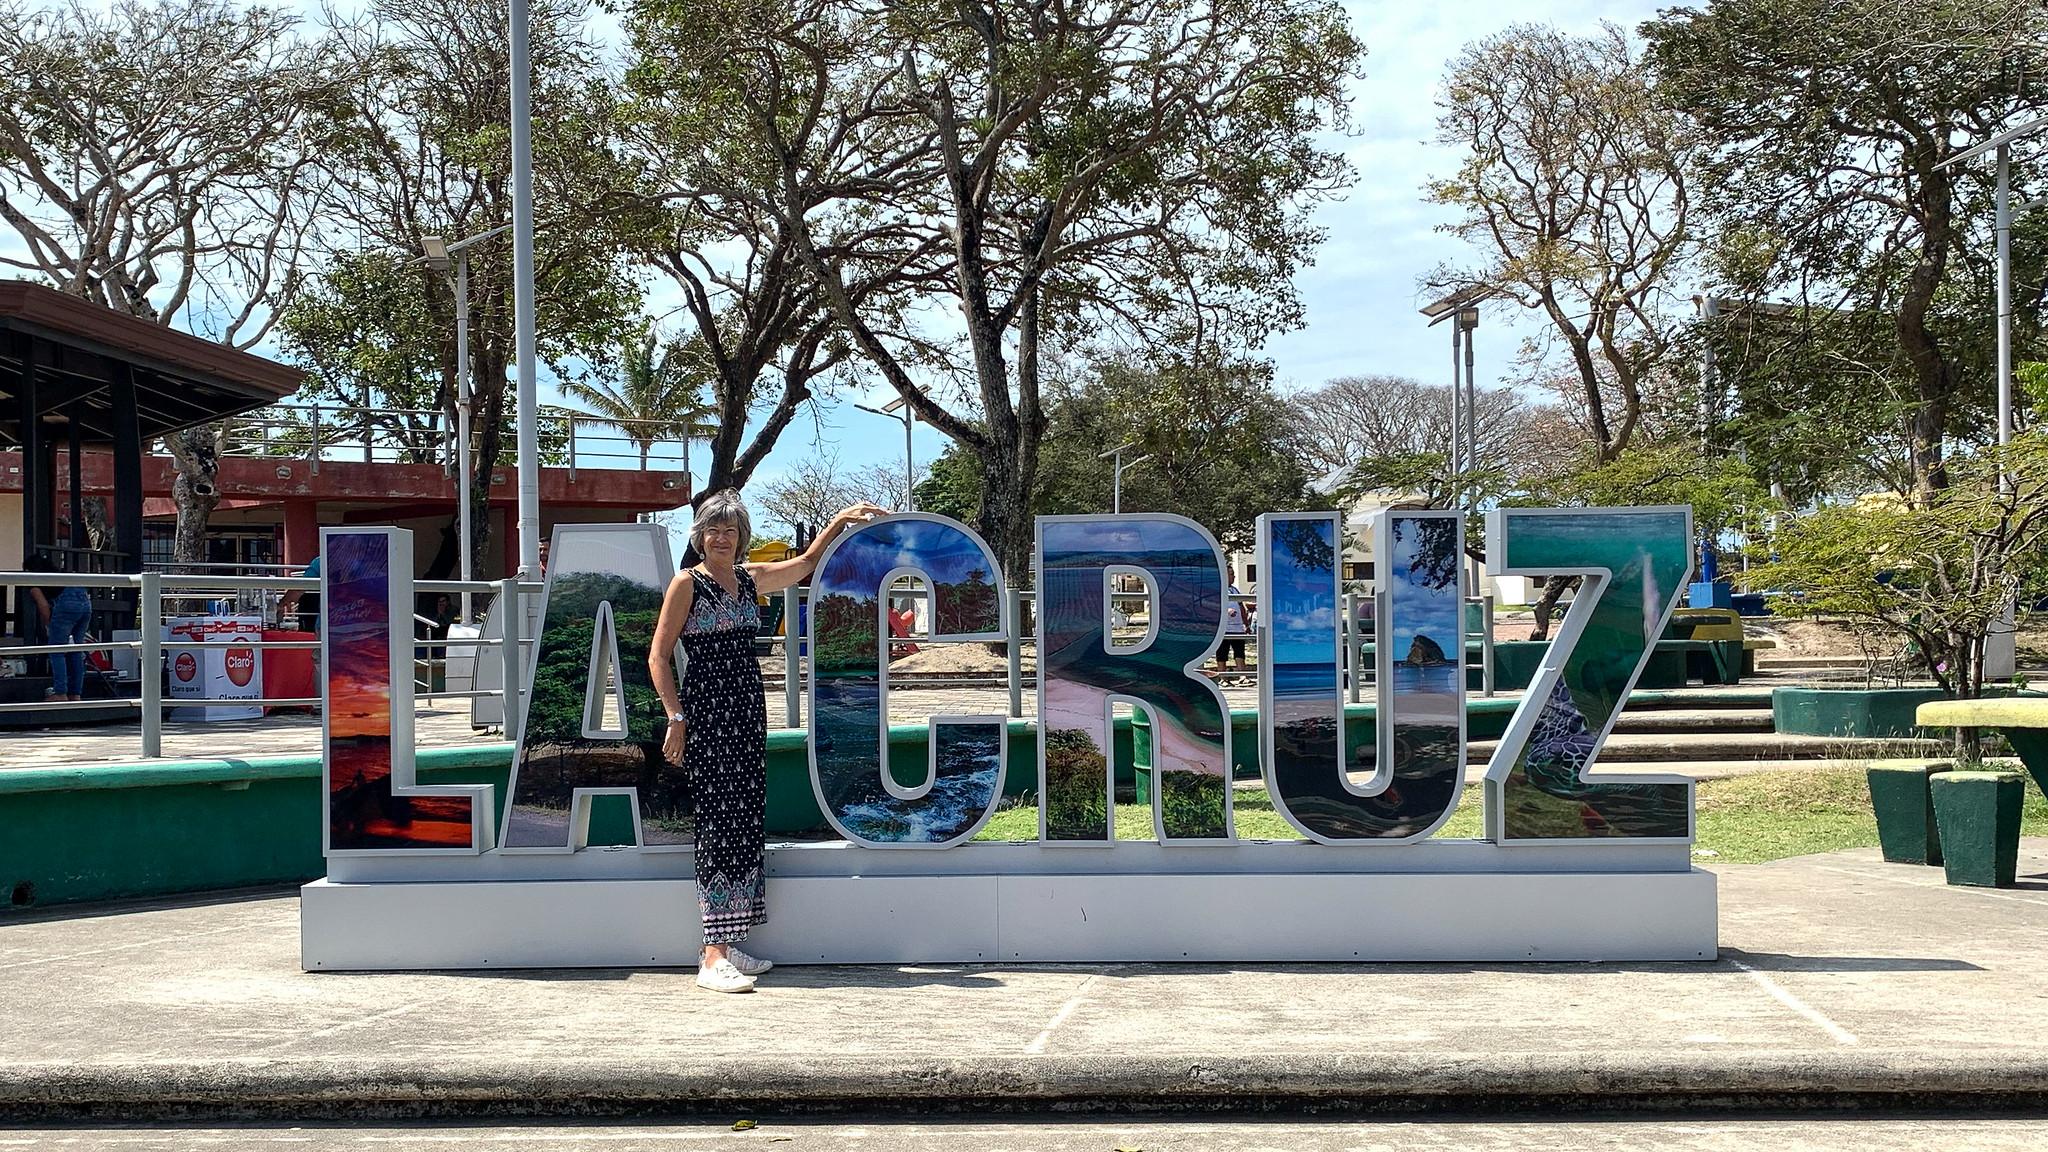 La Cruz - [Costa Rica]